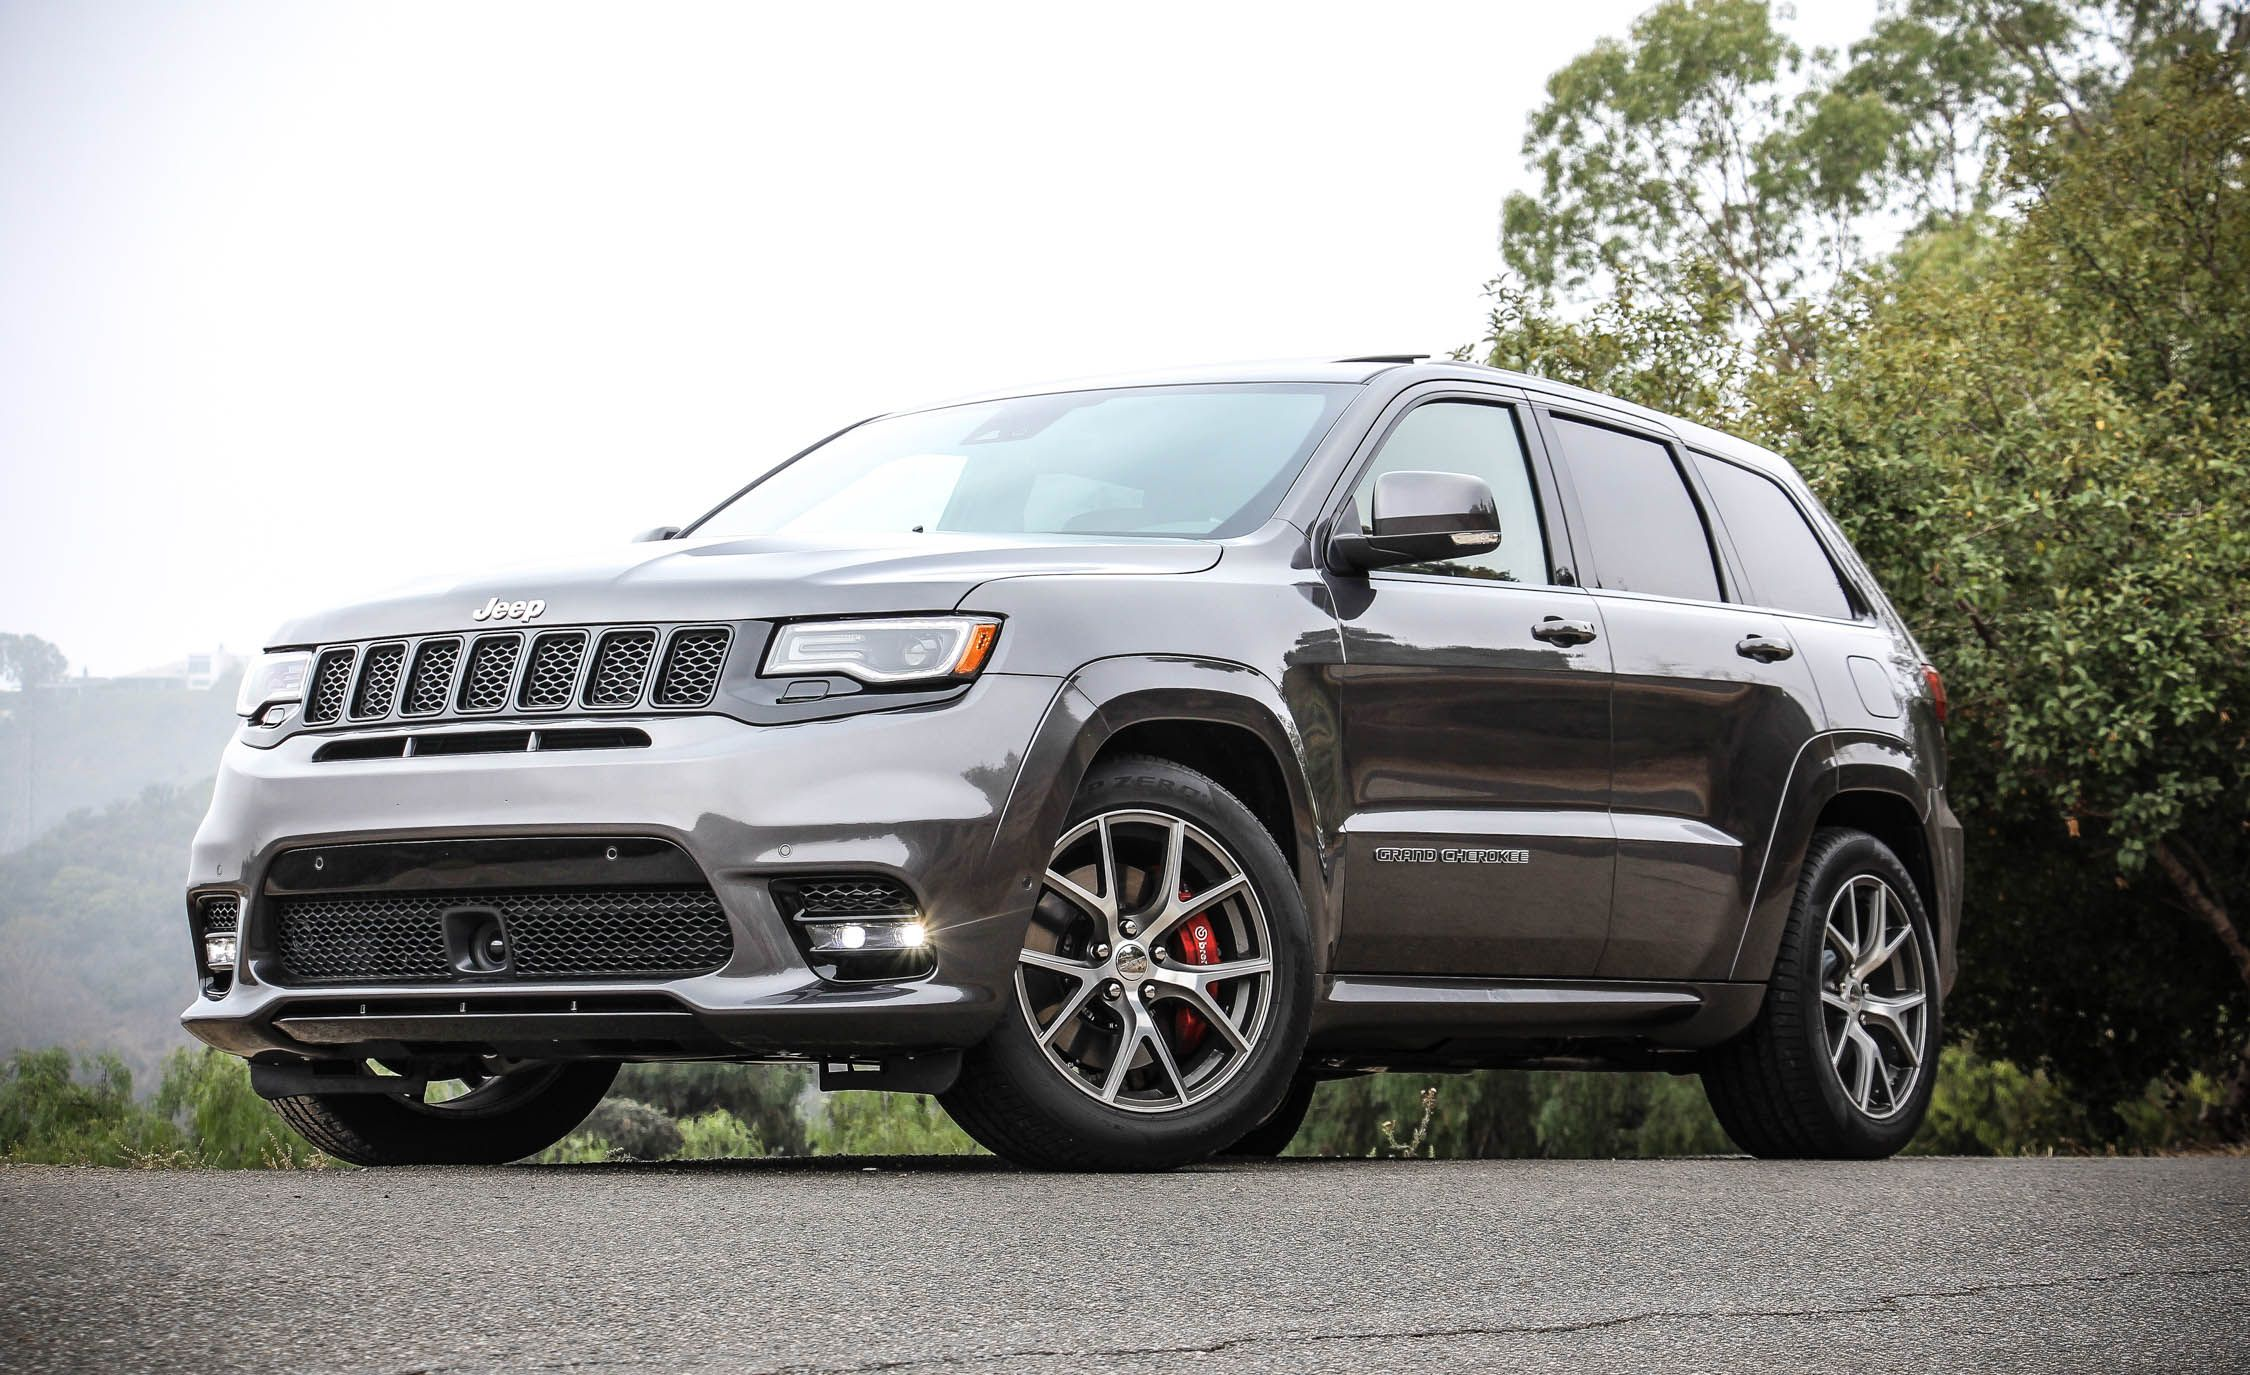 Jeep Grand Cherokee SRT Reviews | Jeep Grand Cherokee SRT Price ...